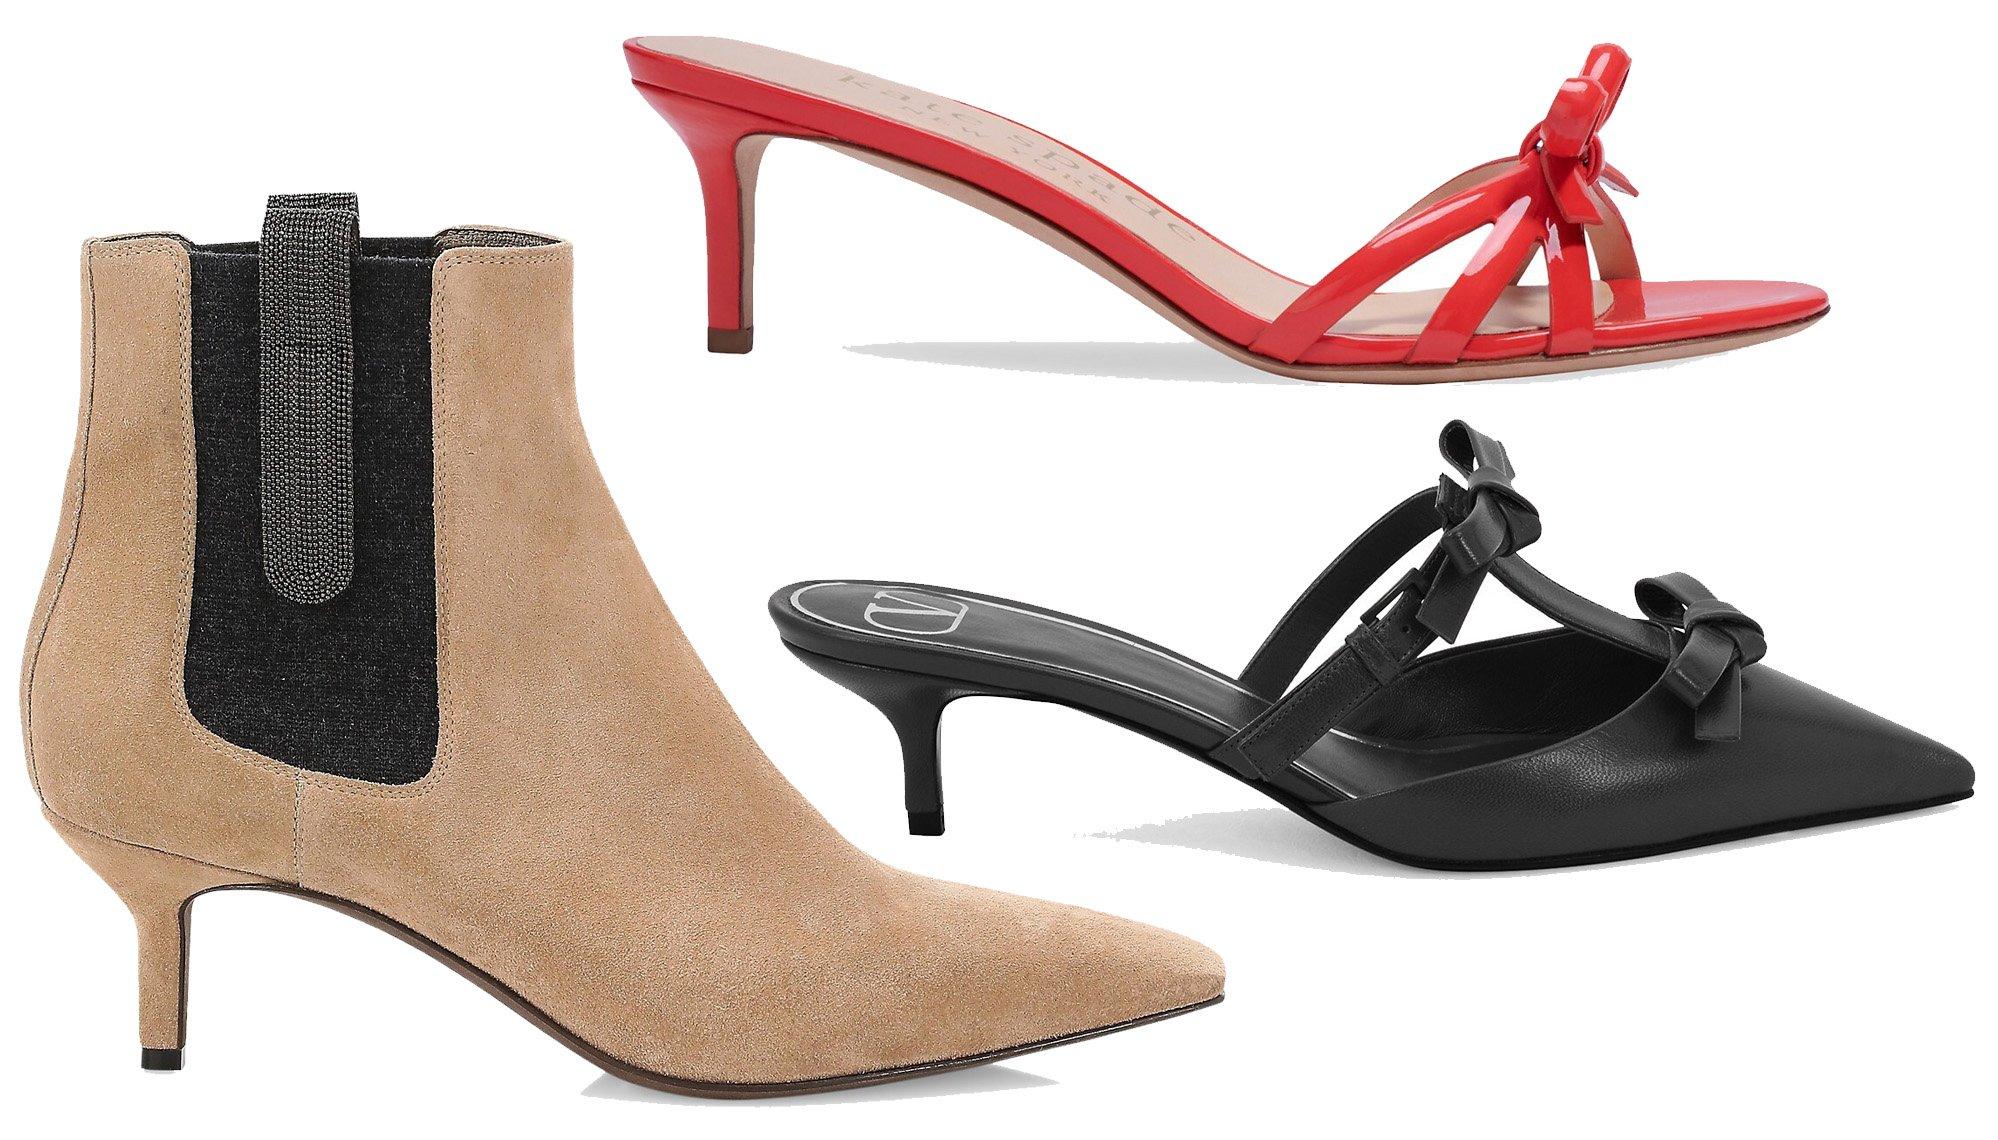 Short thin heels define kitten heels that are usually seen in taller women